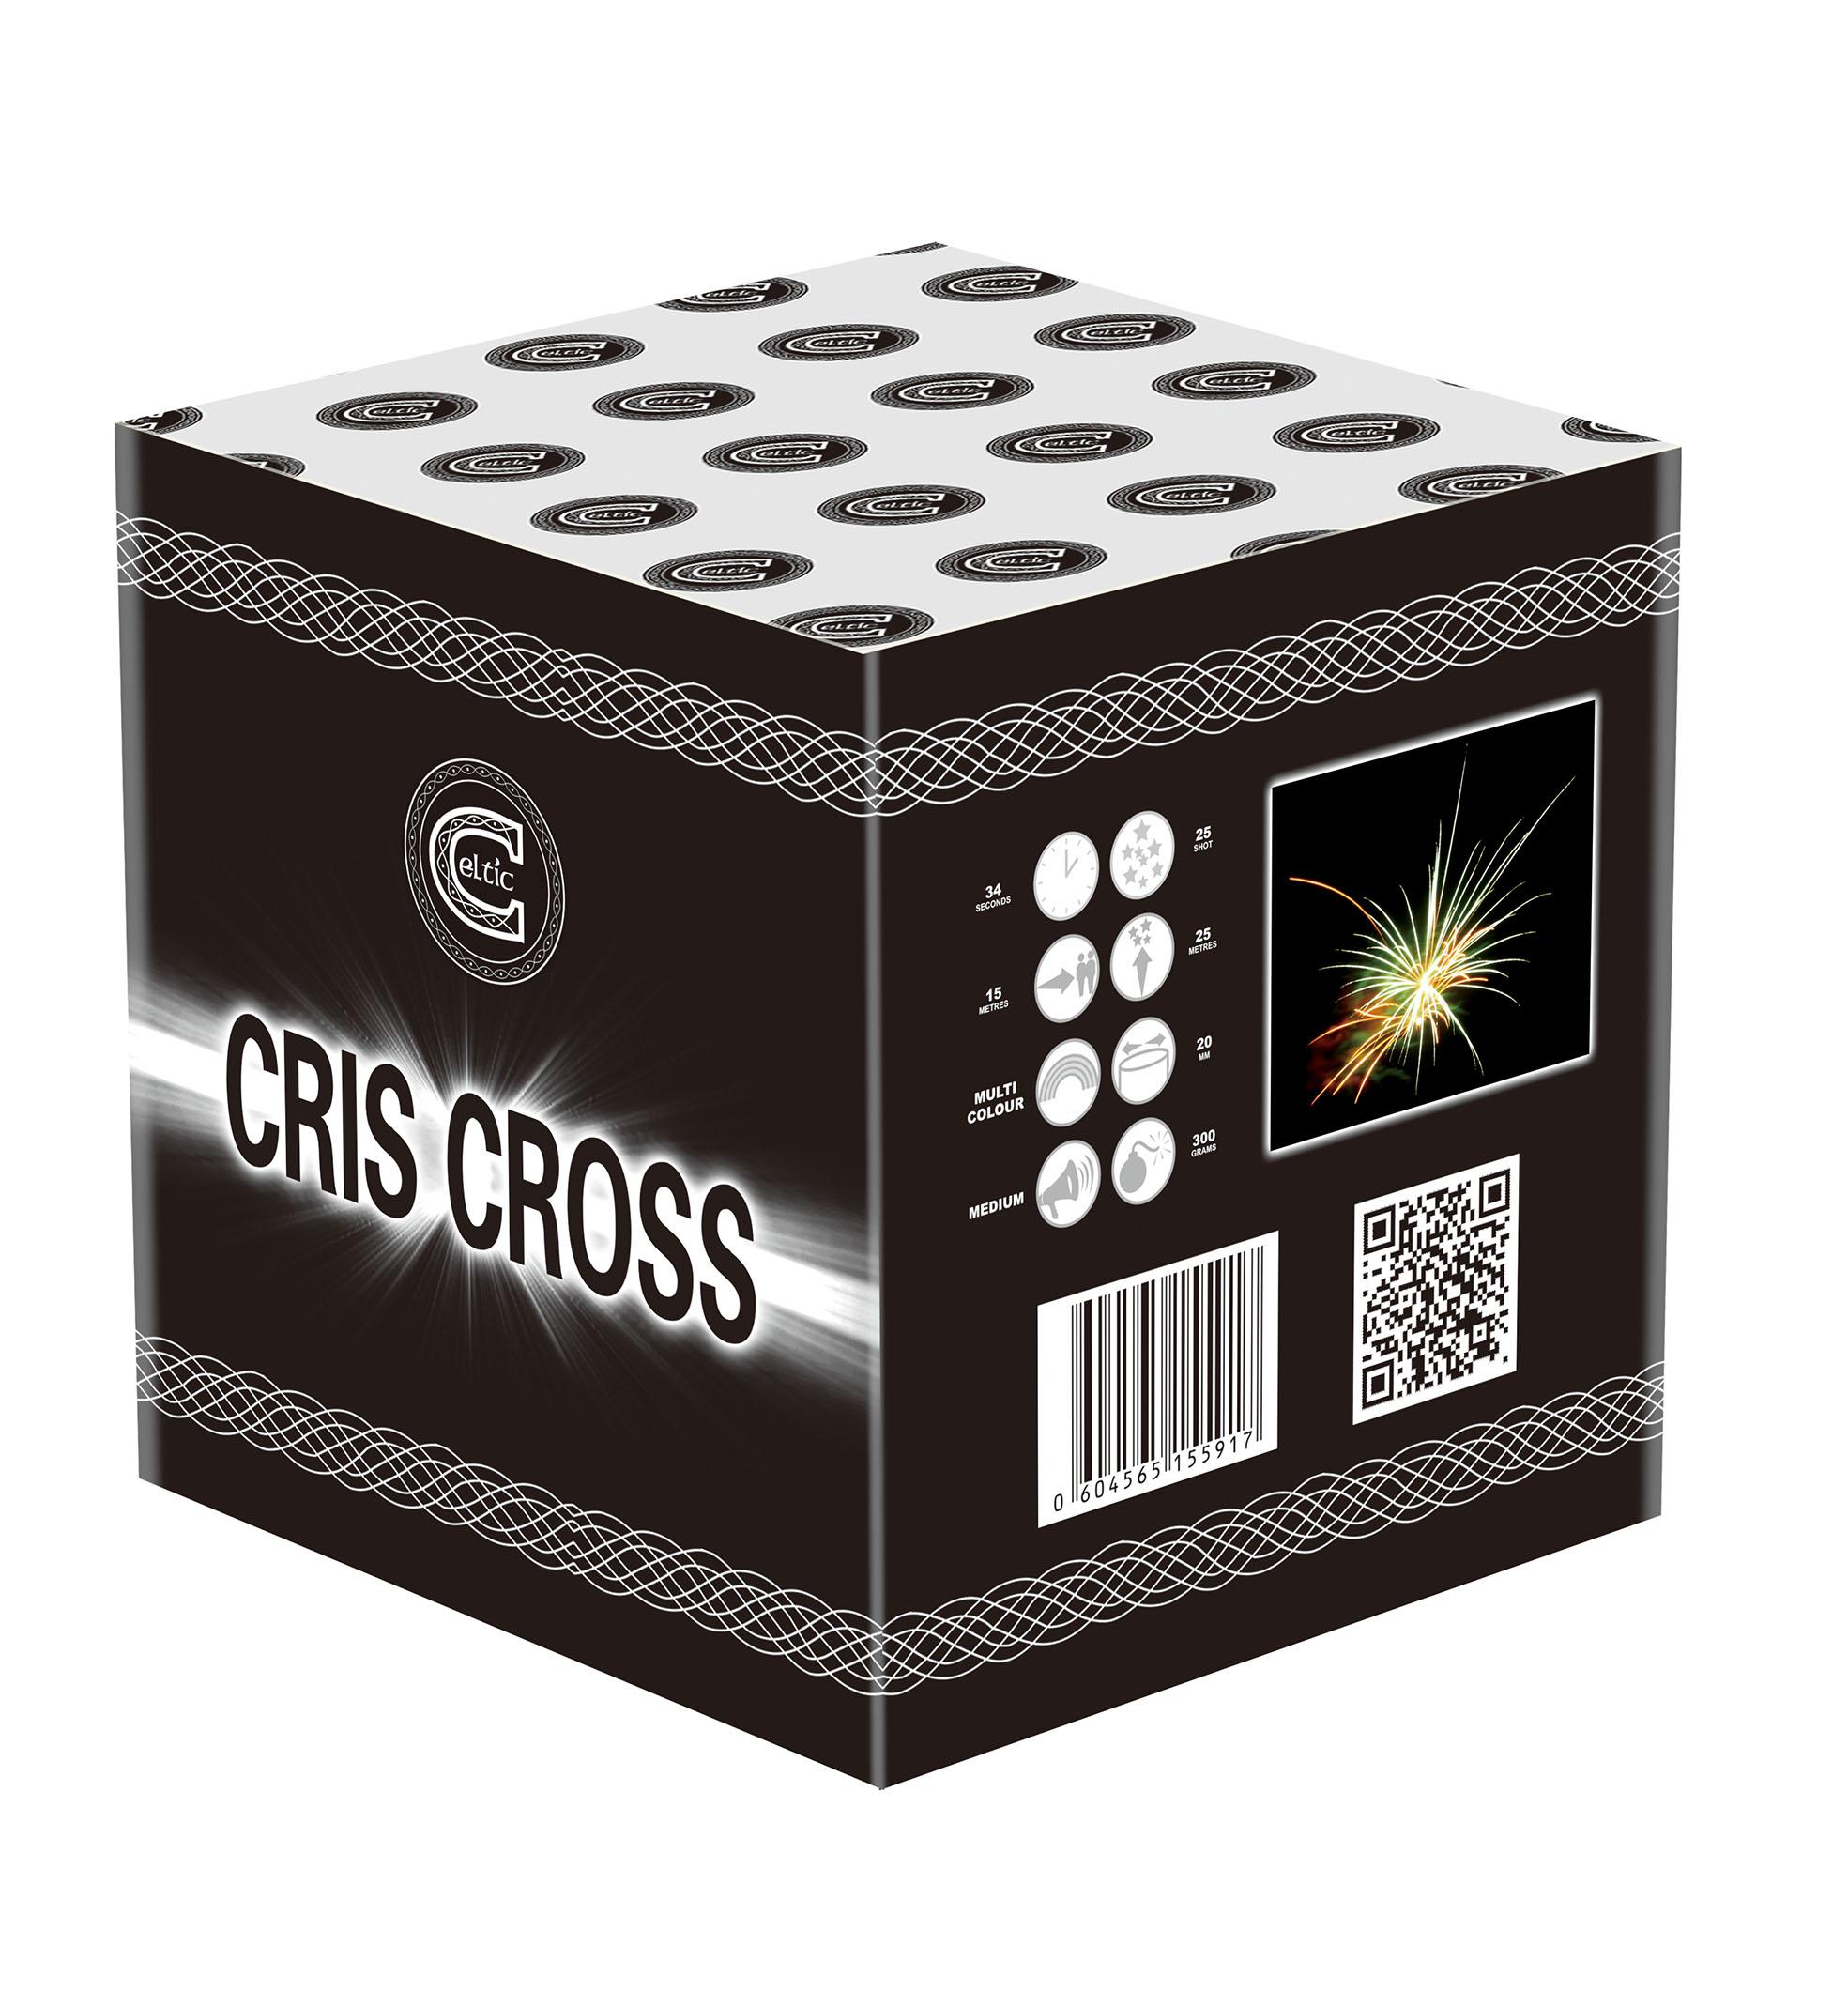 Cris Cross By Celtic Fireworks